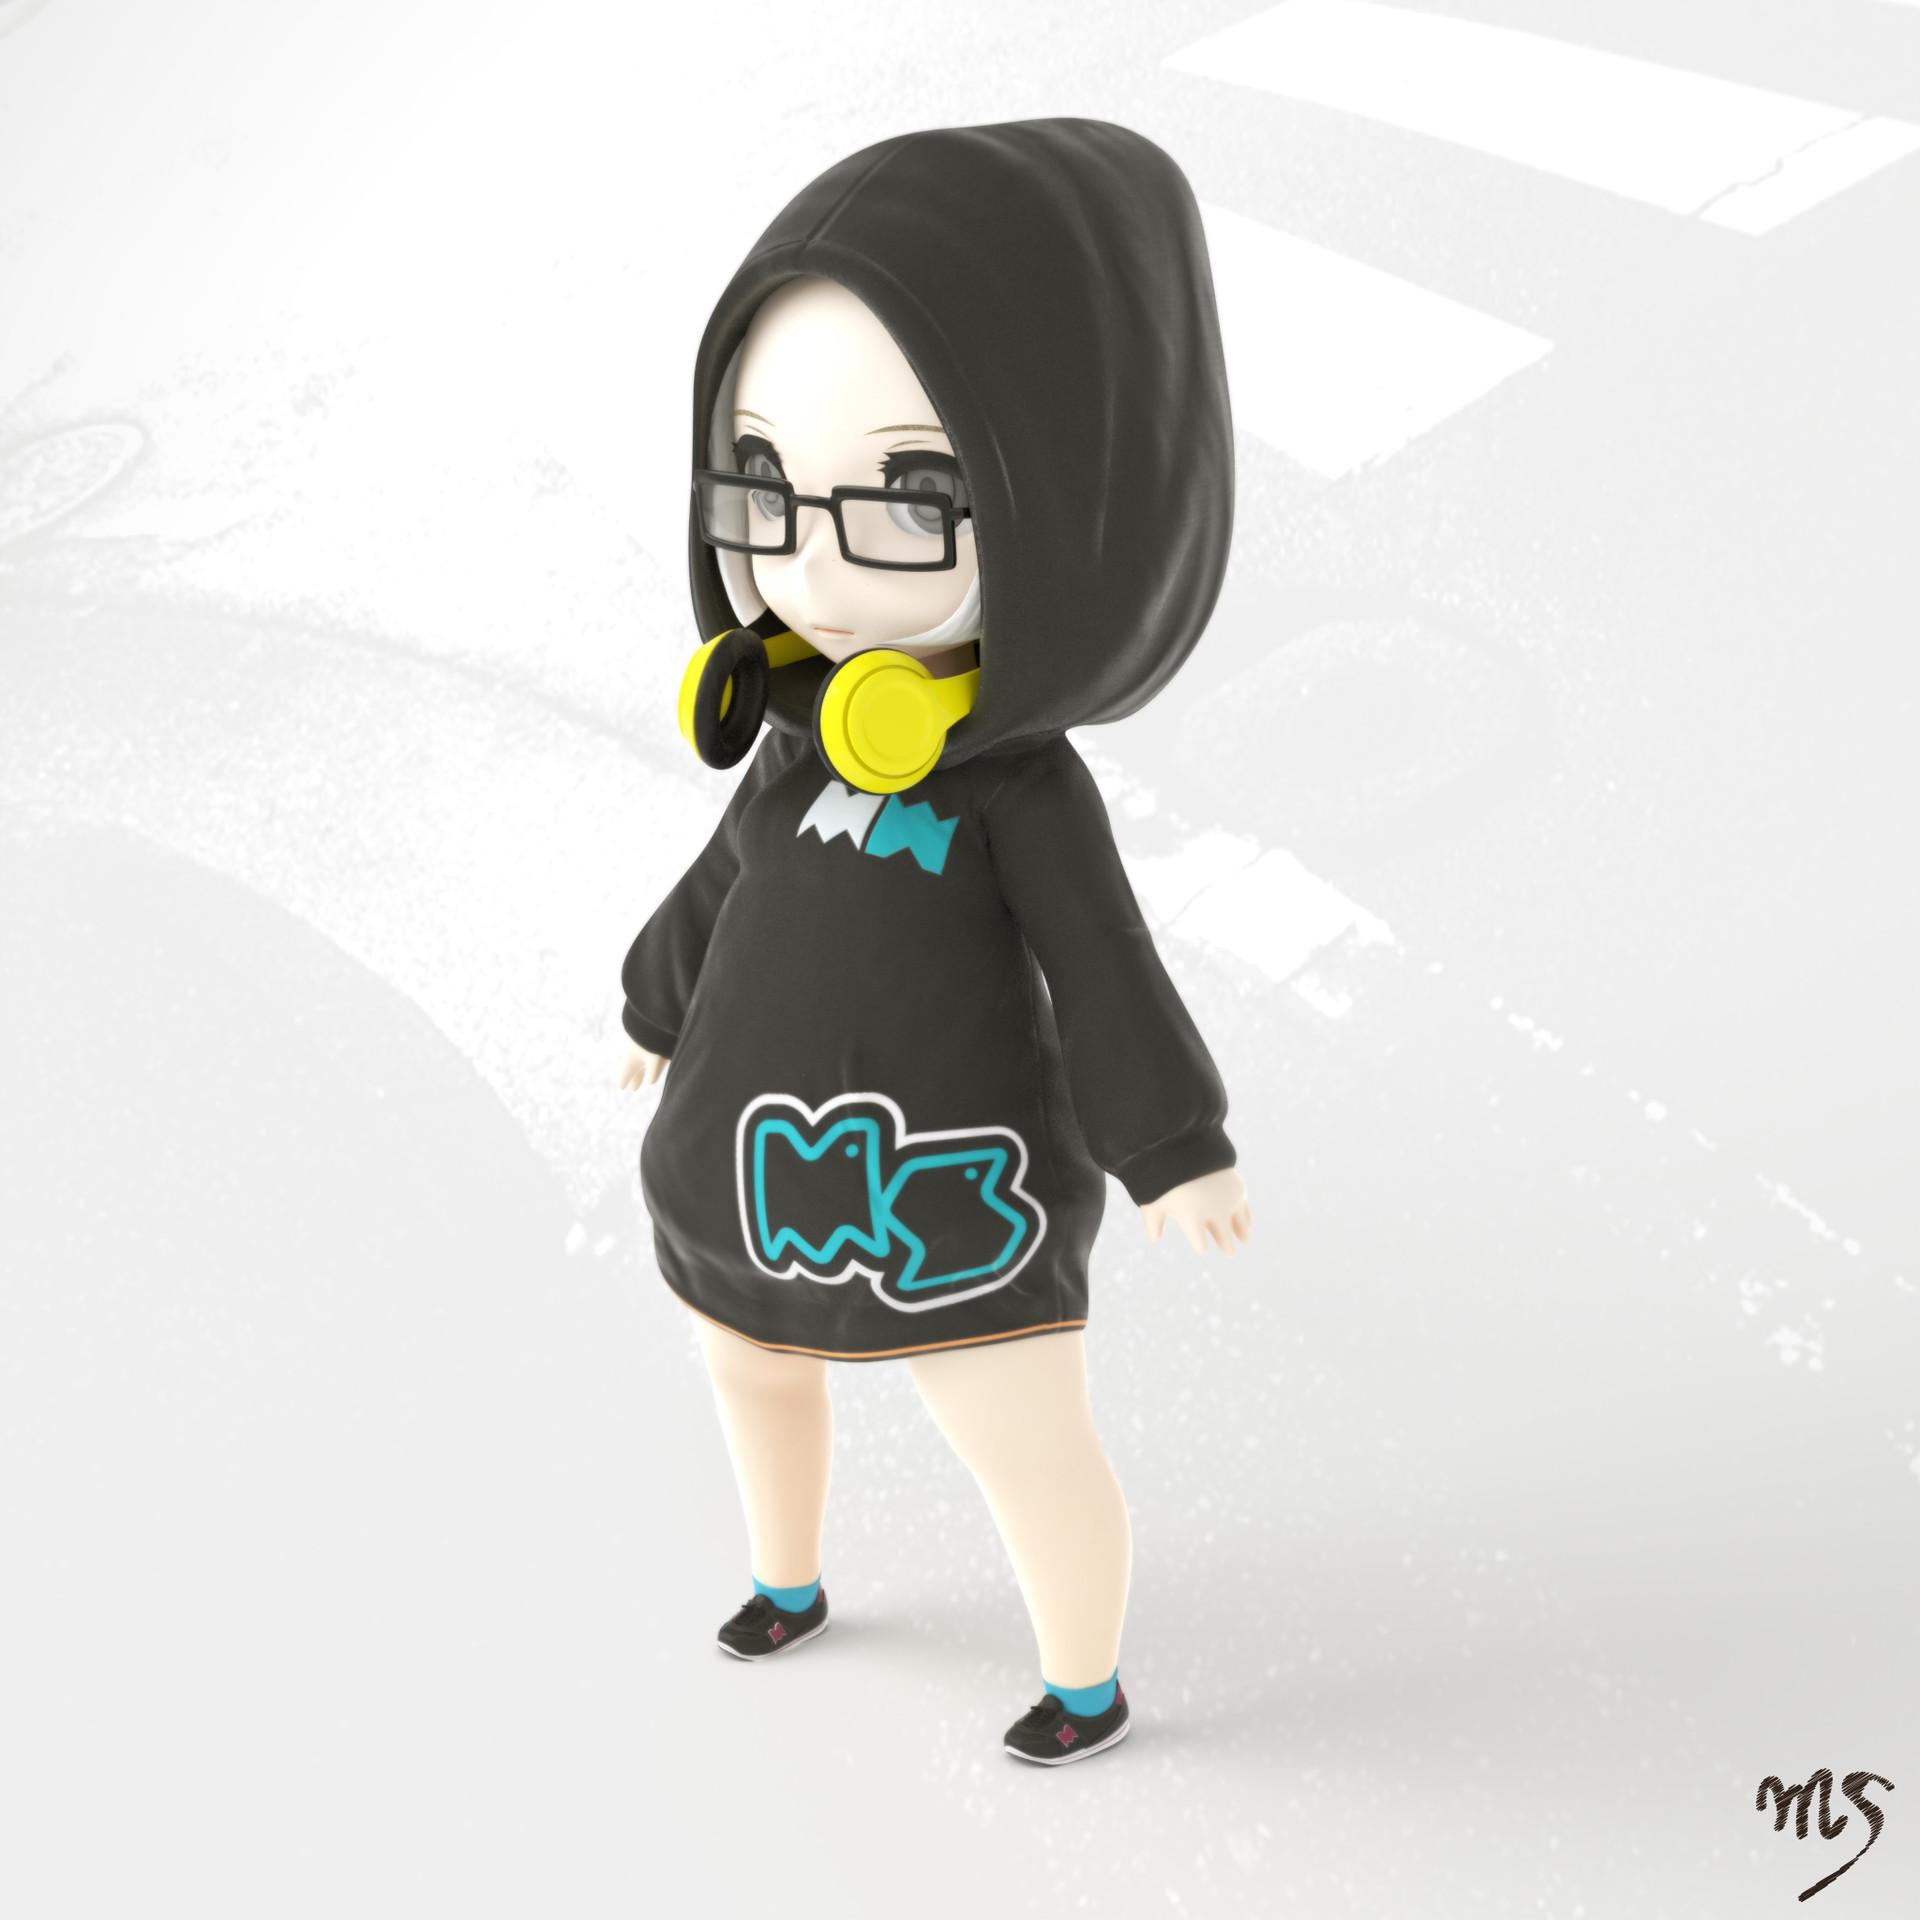 Masatomo suzuki hoodedgirl 01